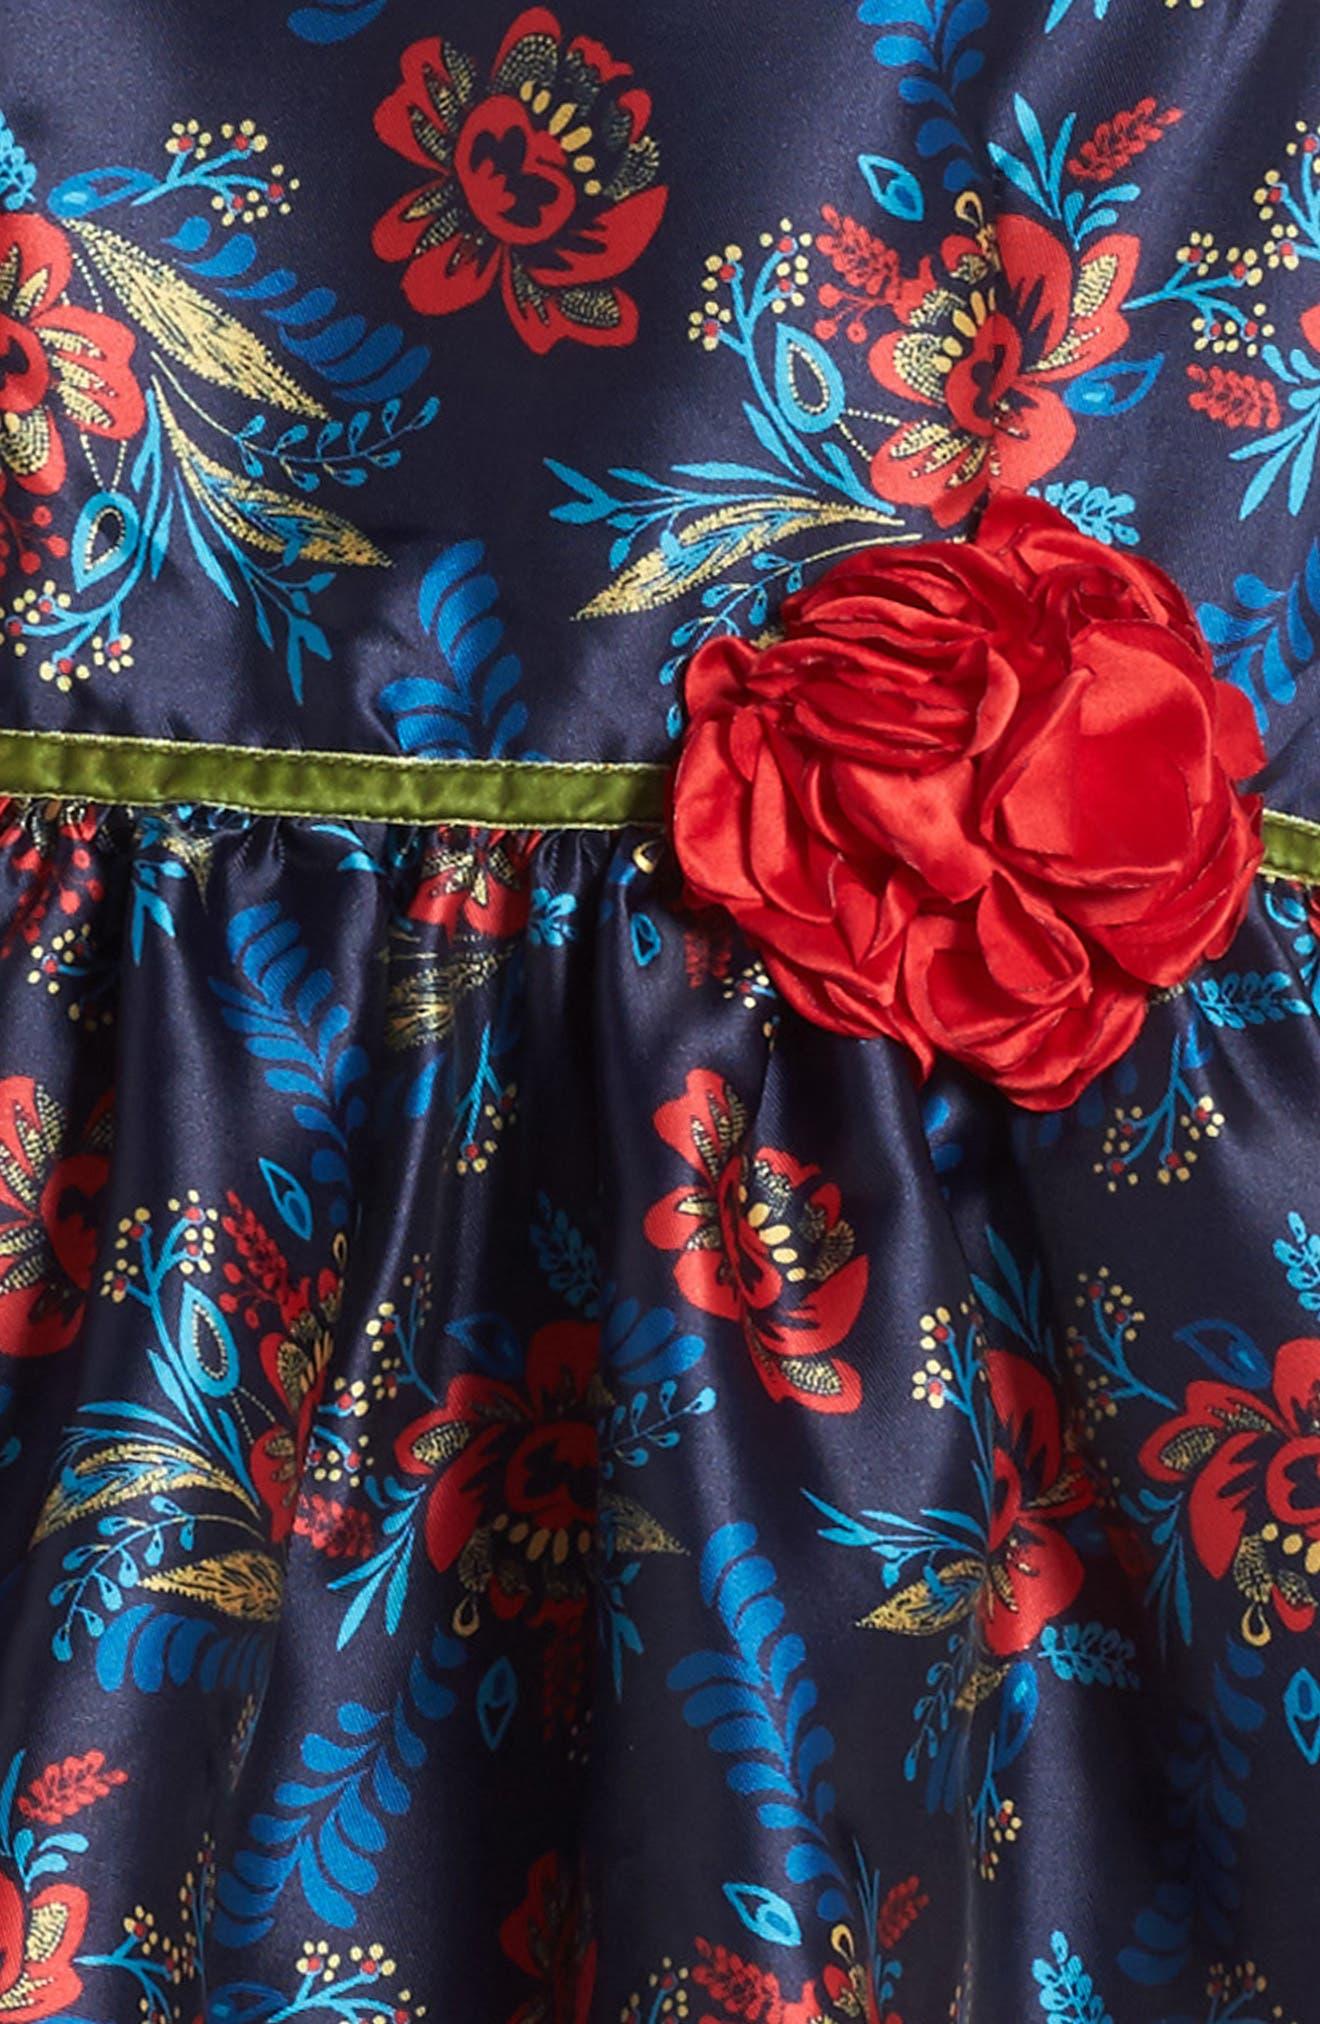 Floral Print Shantung Dress,                             Alternate thumbnail 3, color,                             415